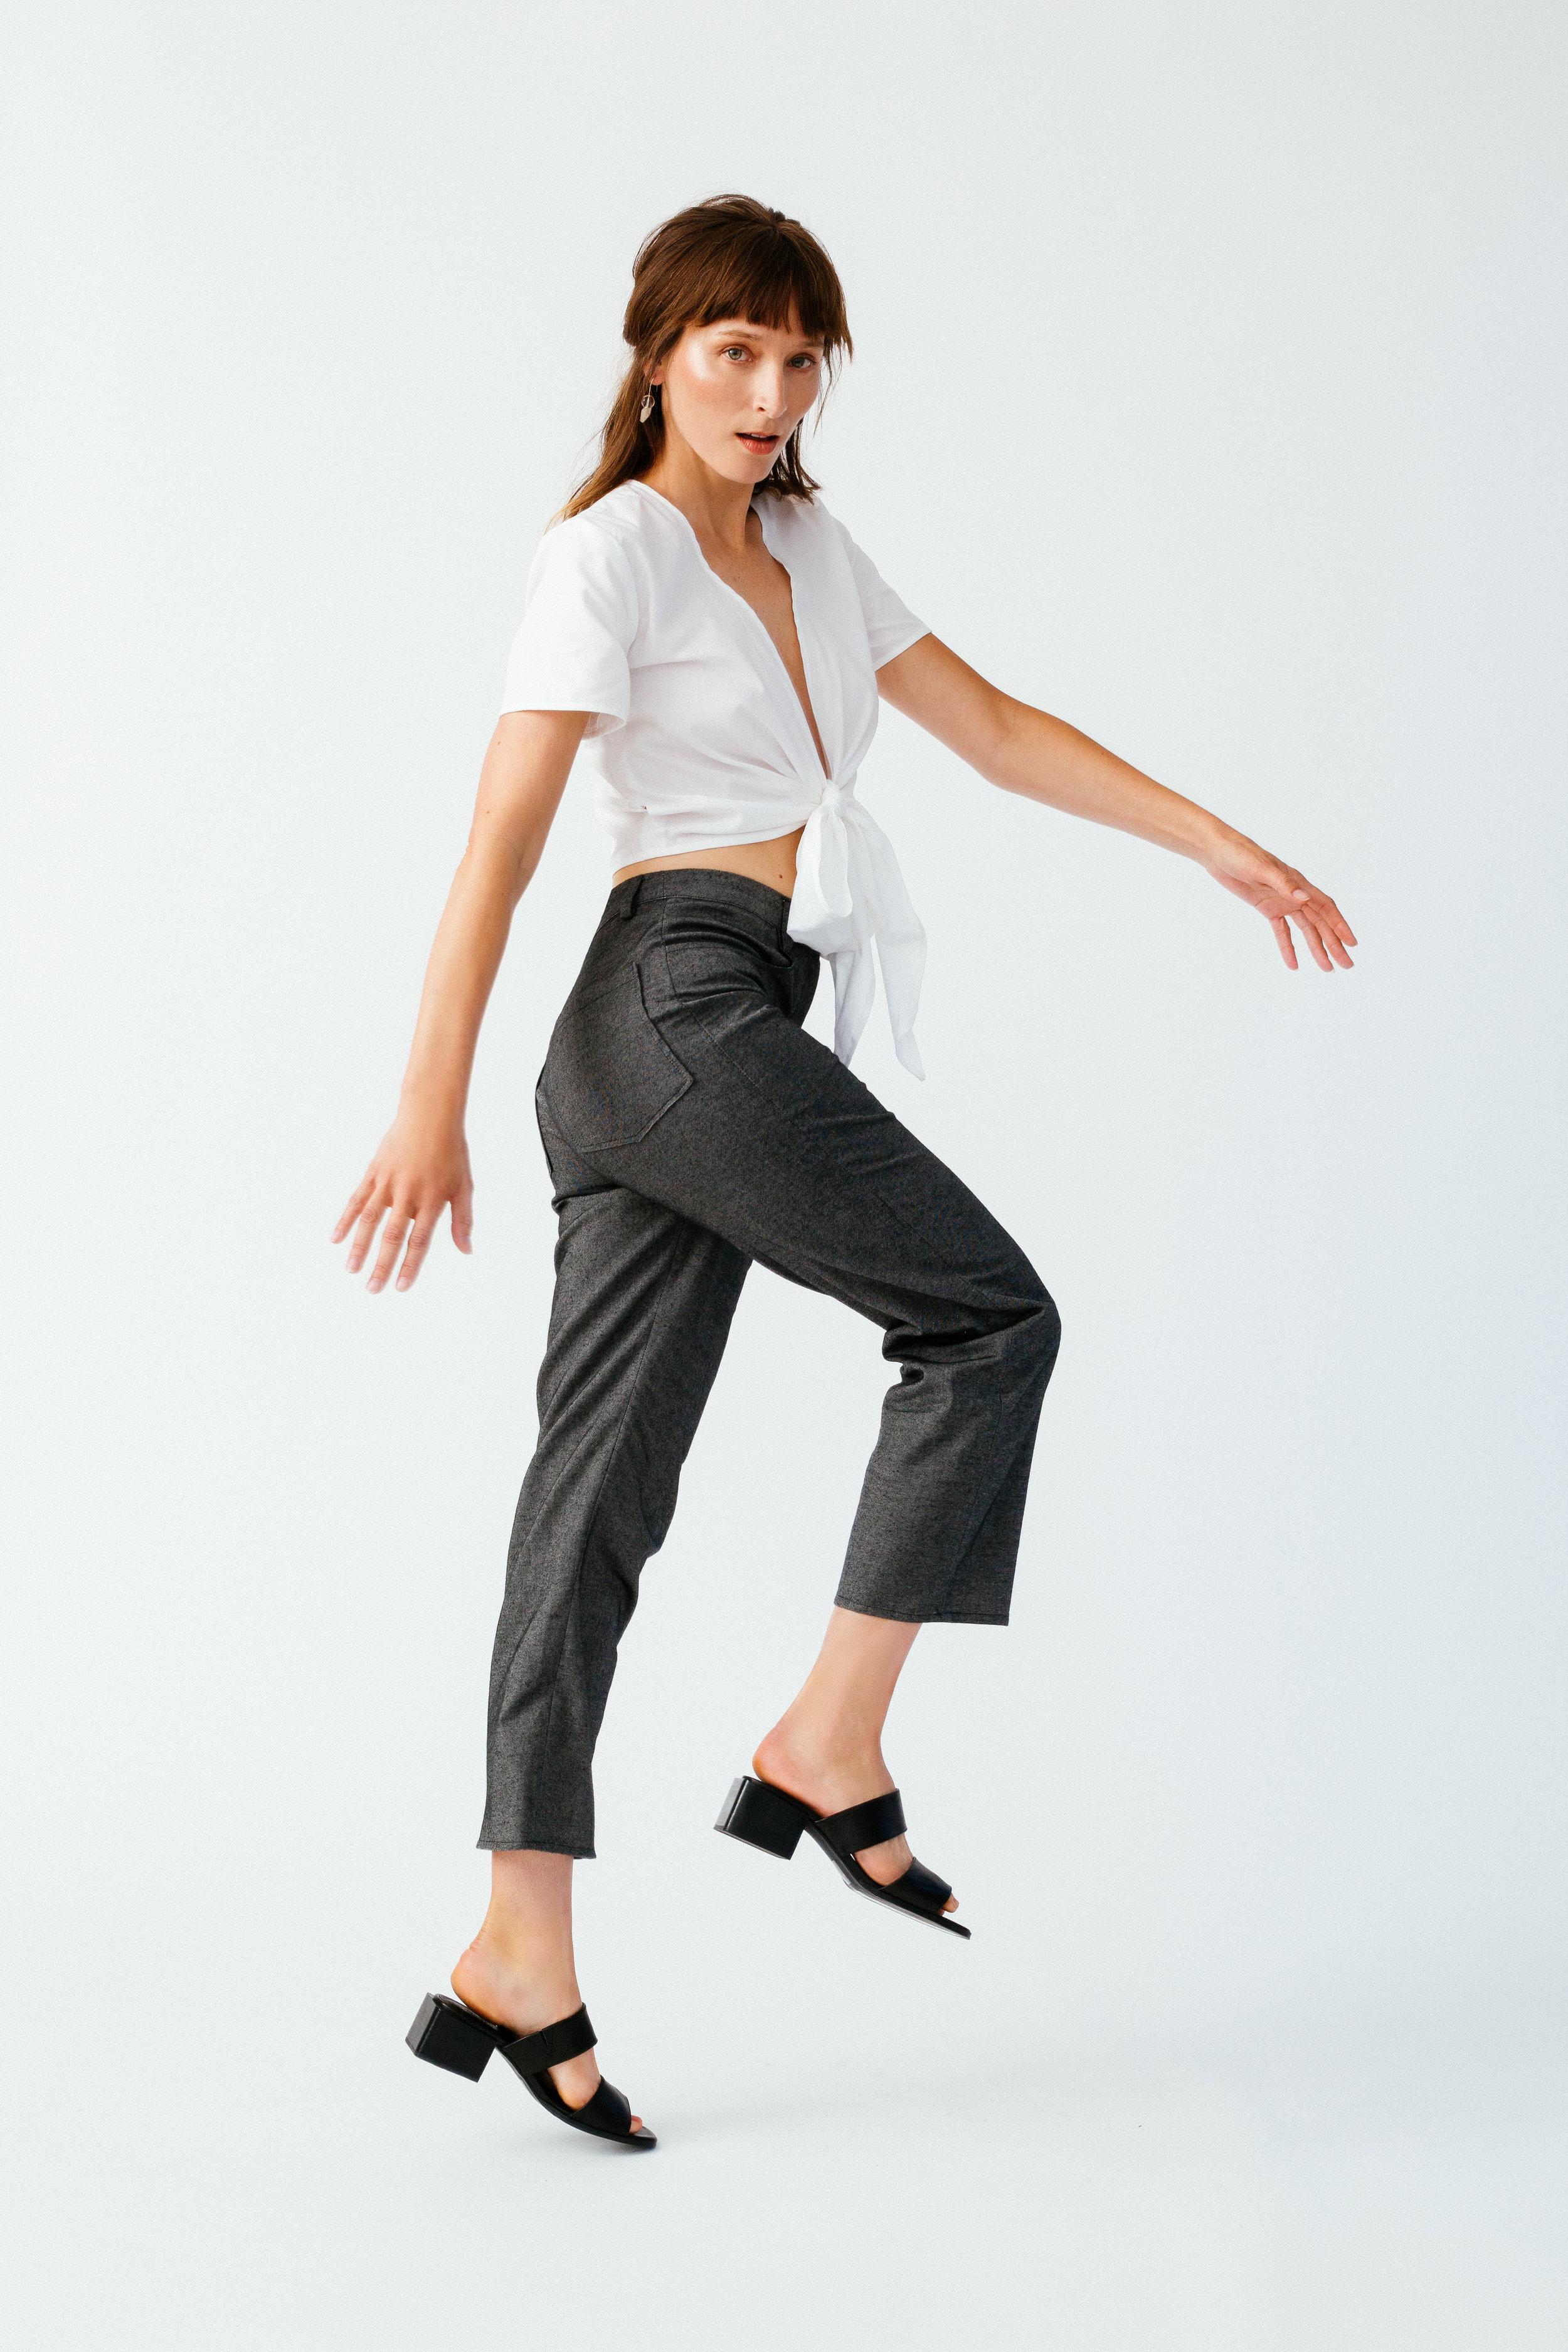 ellice ruiz_sustainable workwear_organic jeans.jpg